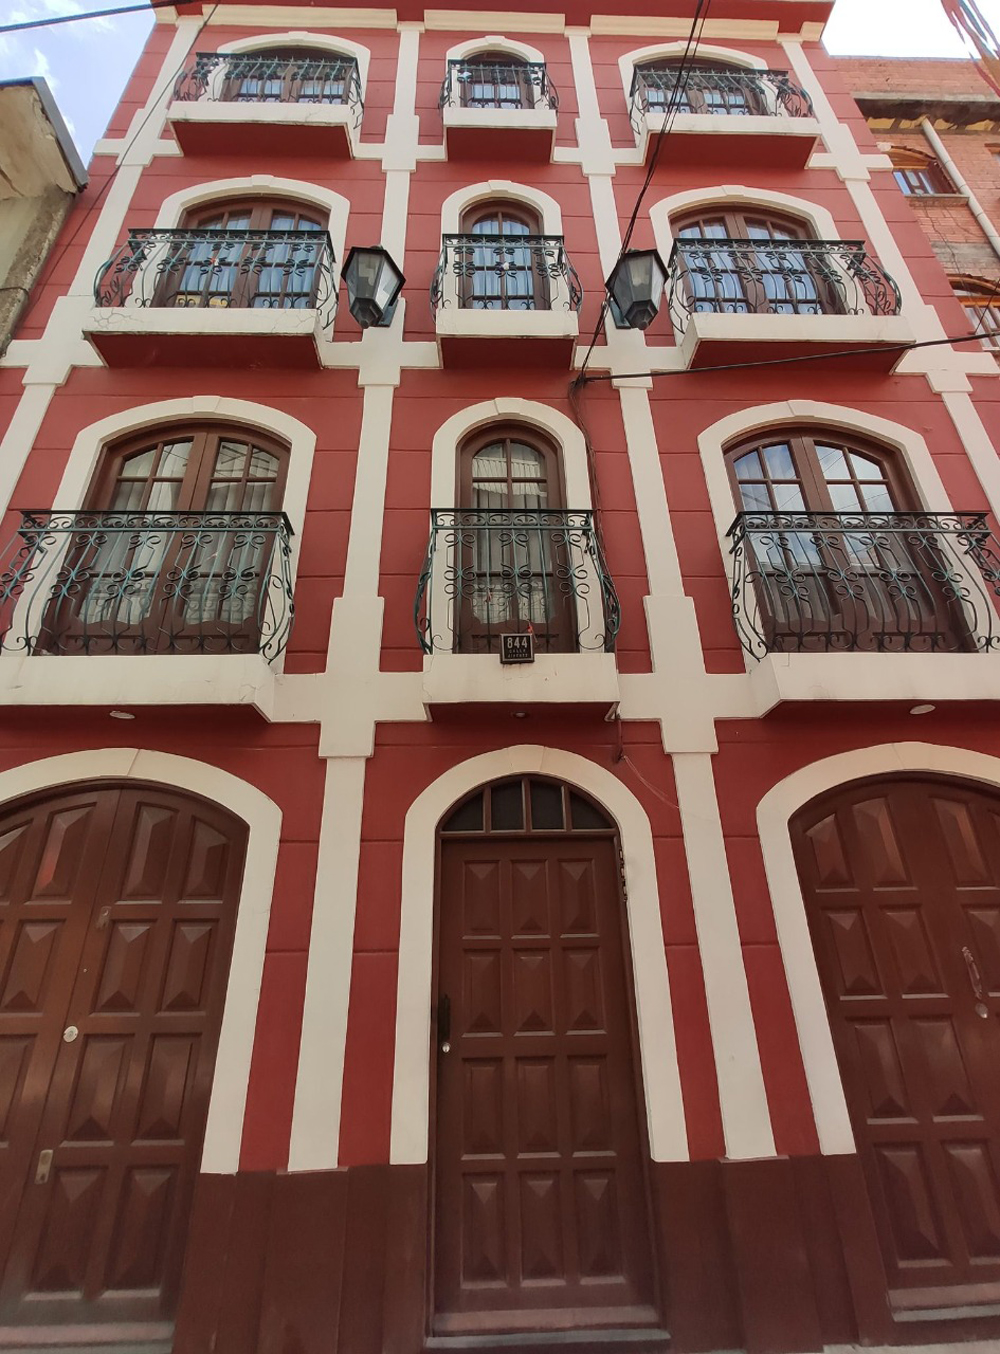 La restauracion de fachadas patrimoniales